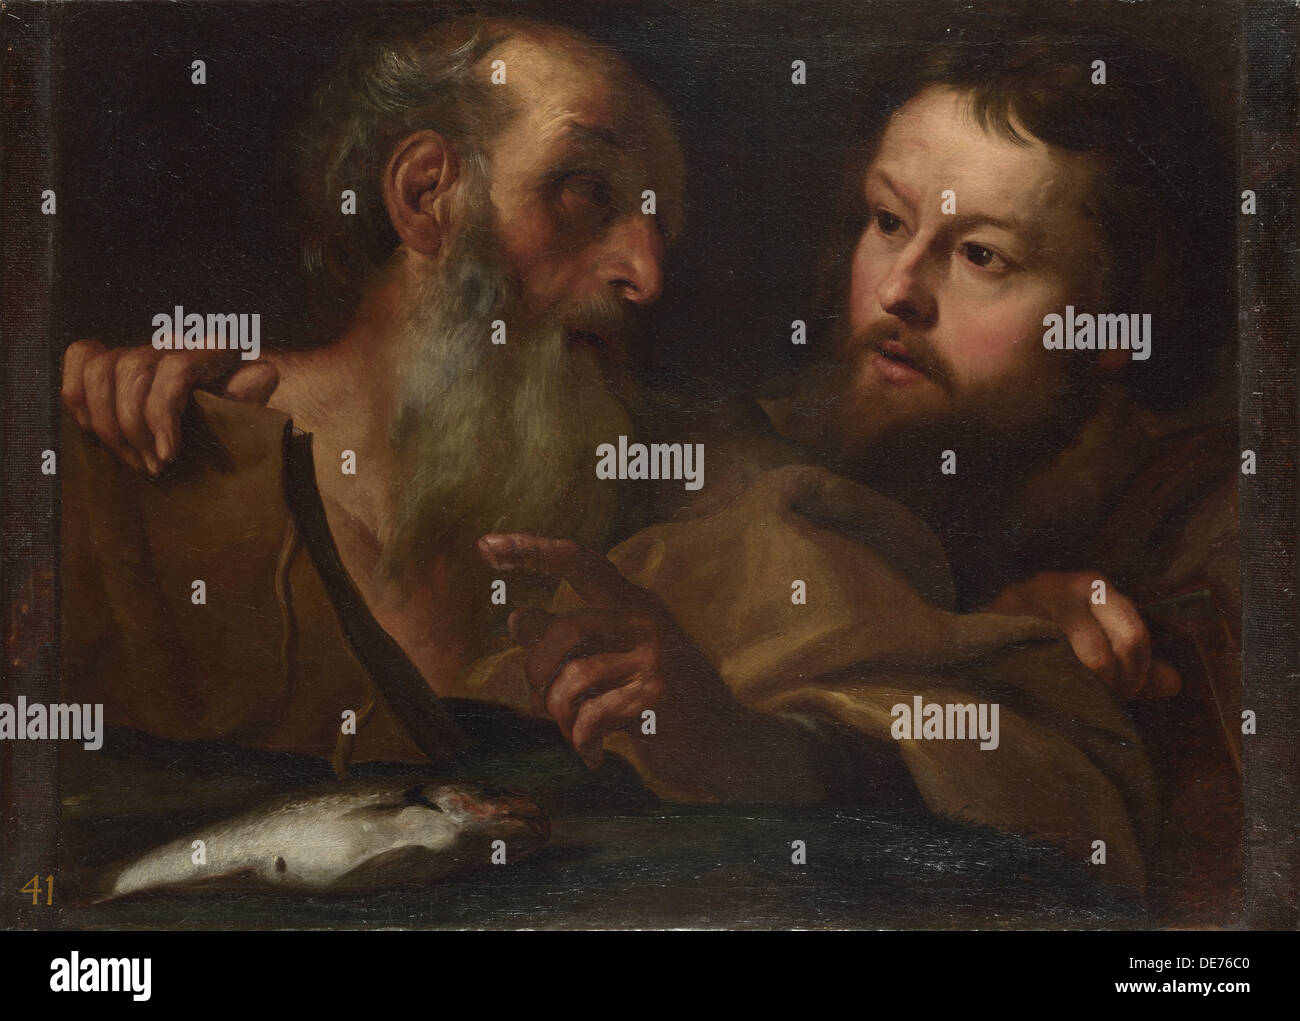 Saints Andrew and Thomas, before 1627. Artist: Bernini, Gianlorenzo (1598-1680) - Stock Image